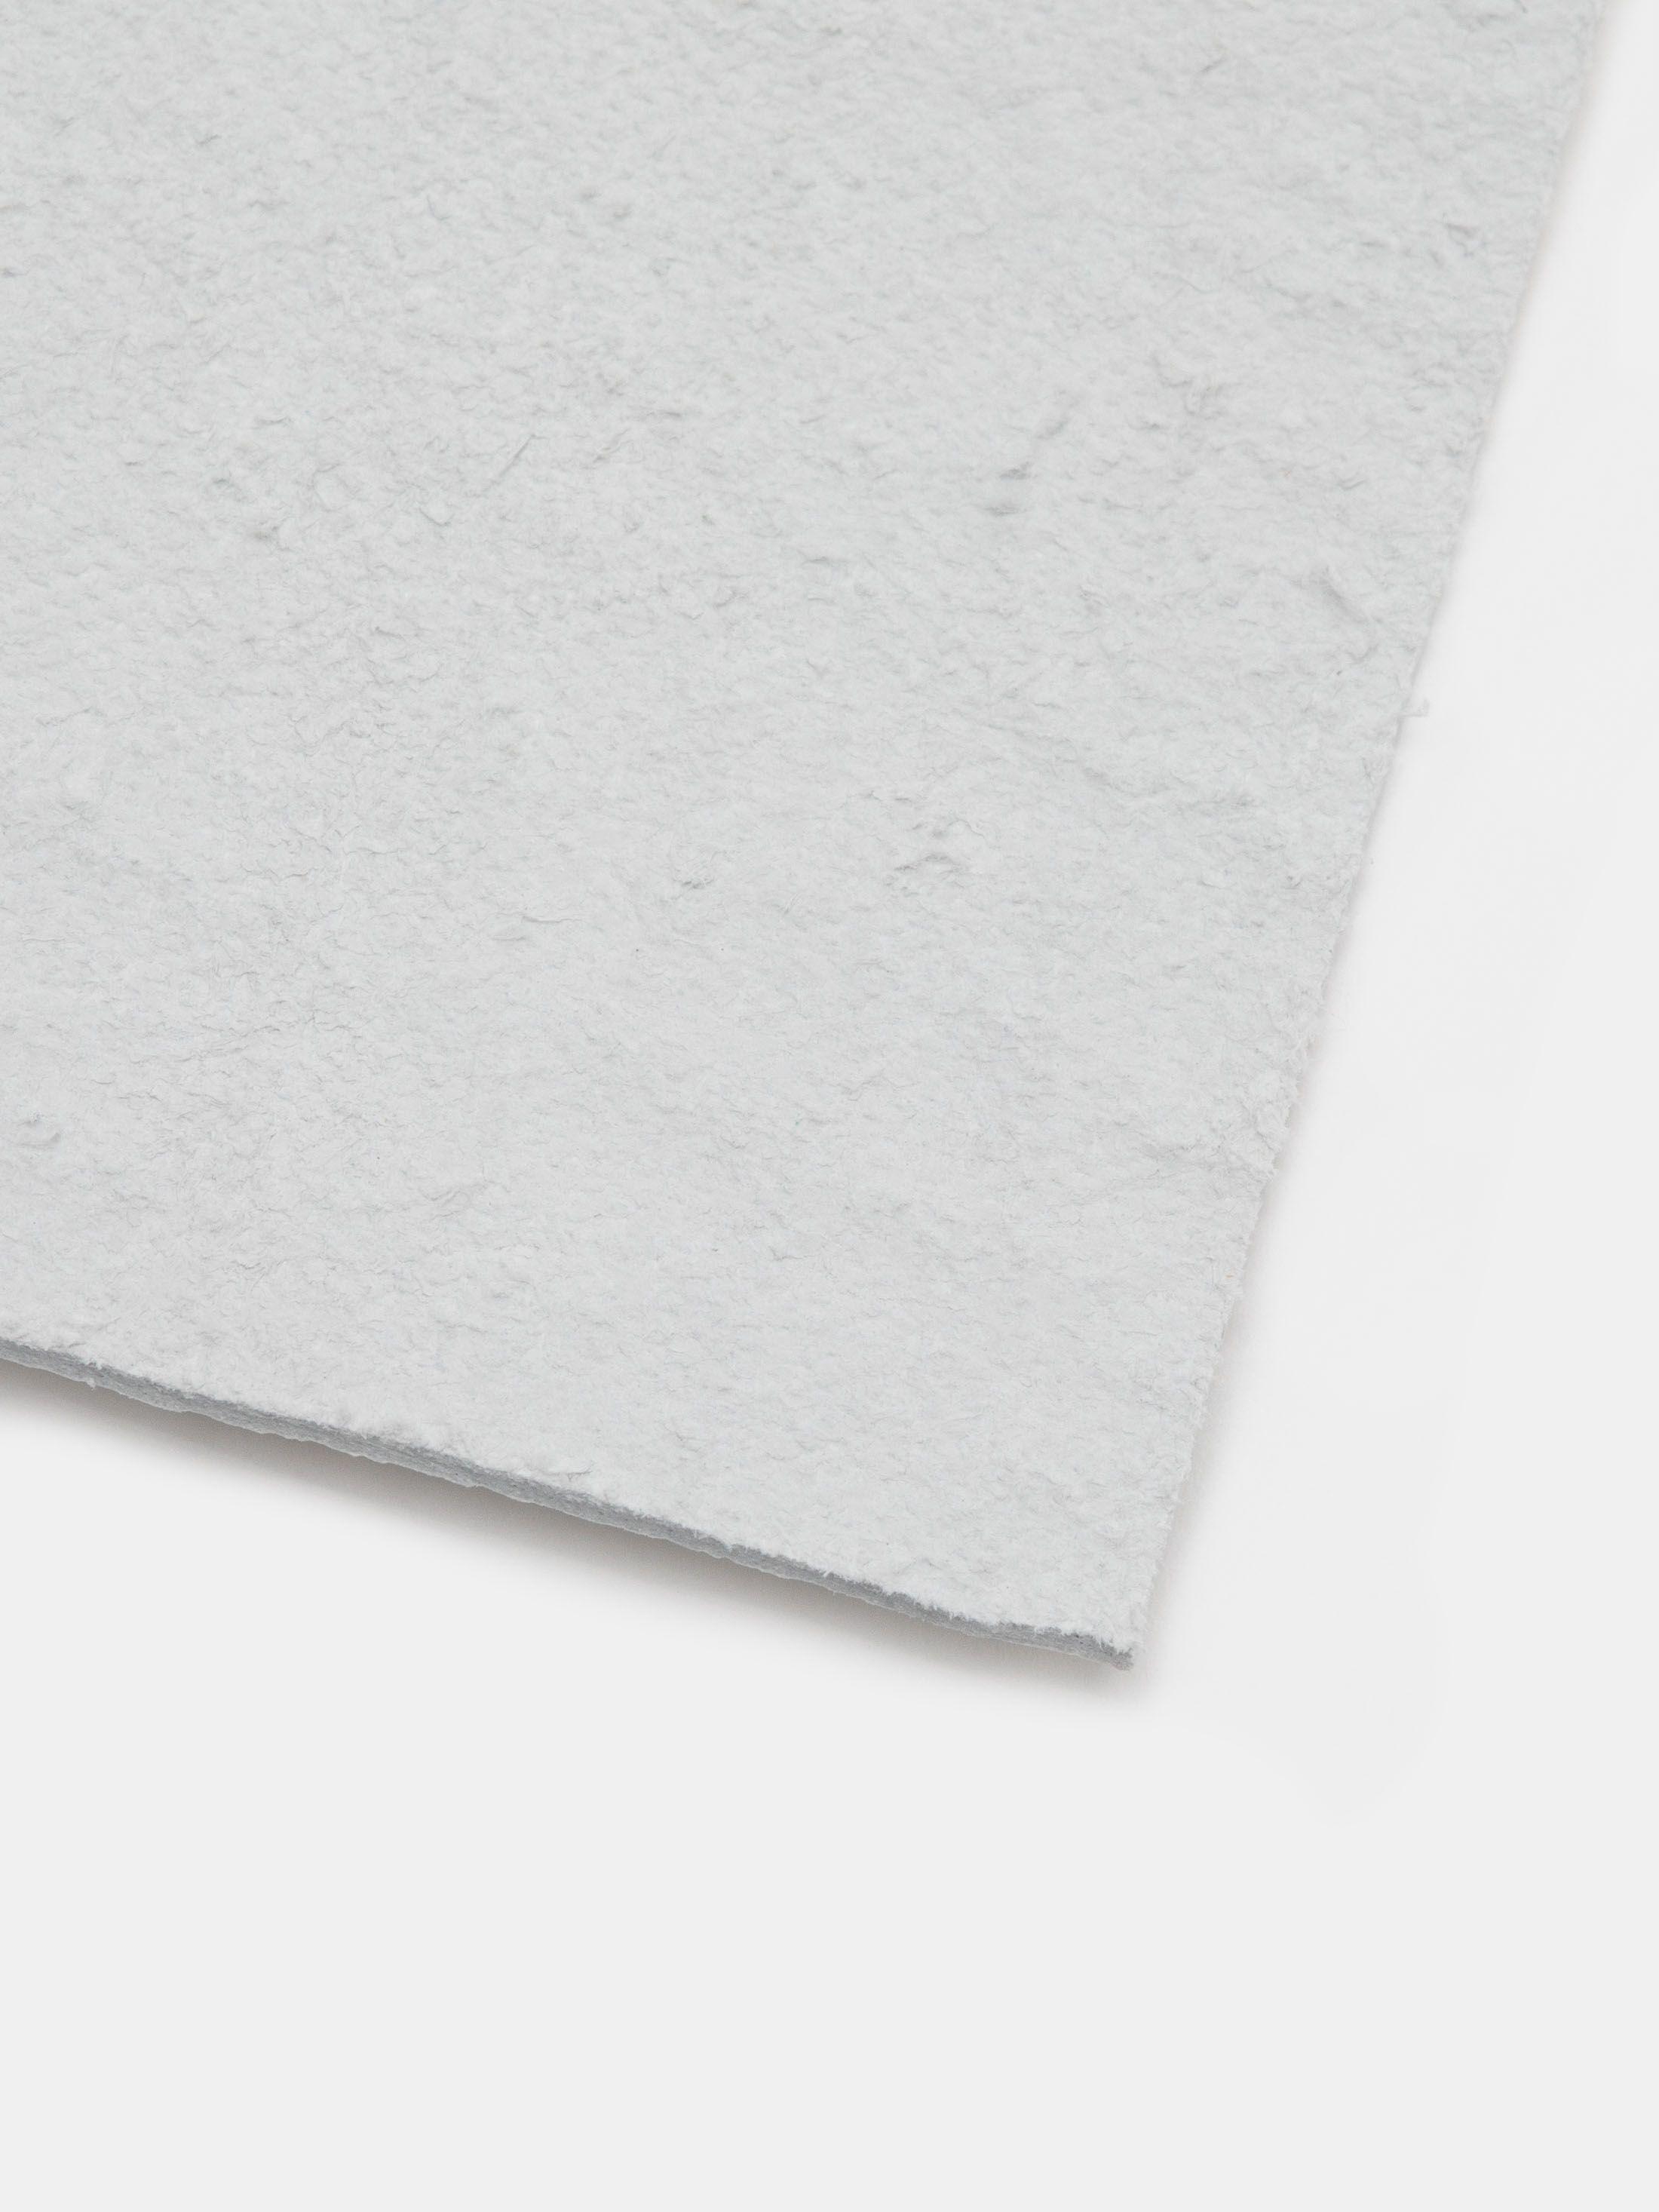 Custom Swing Tag Printing